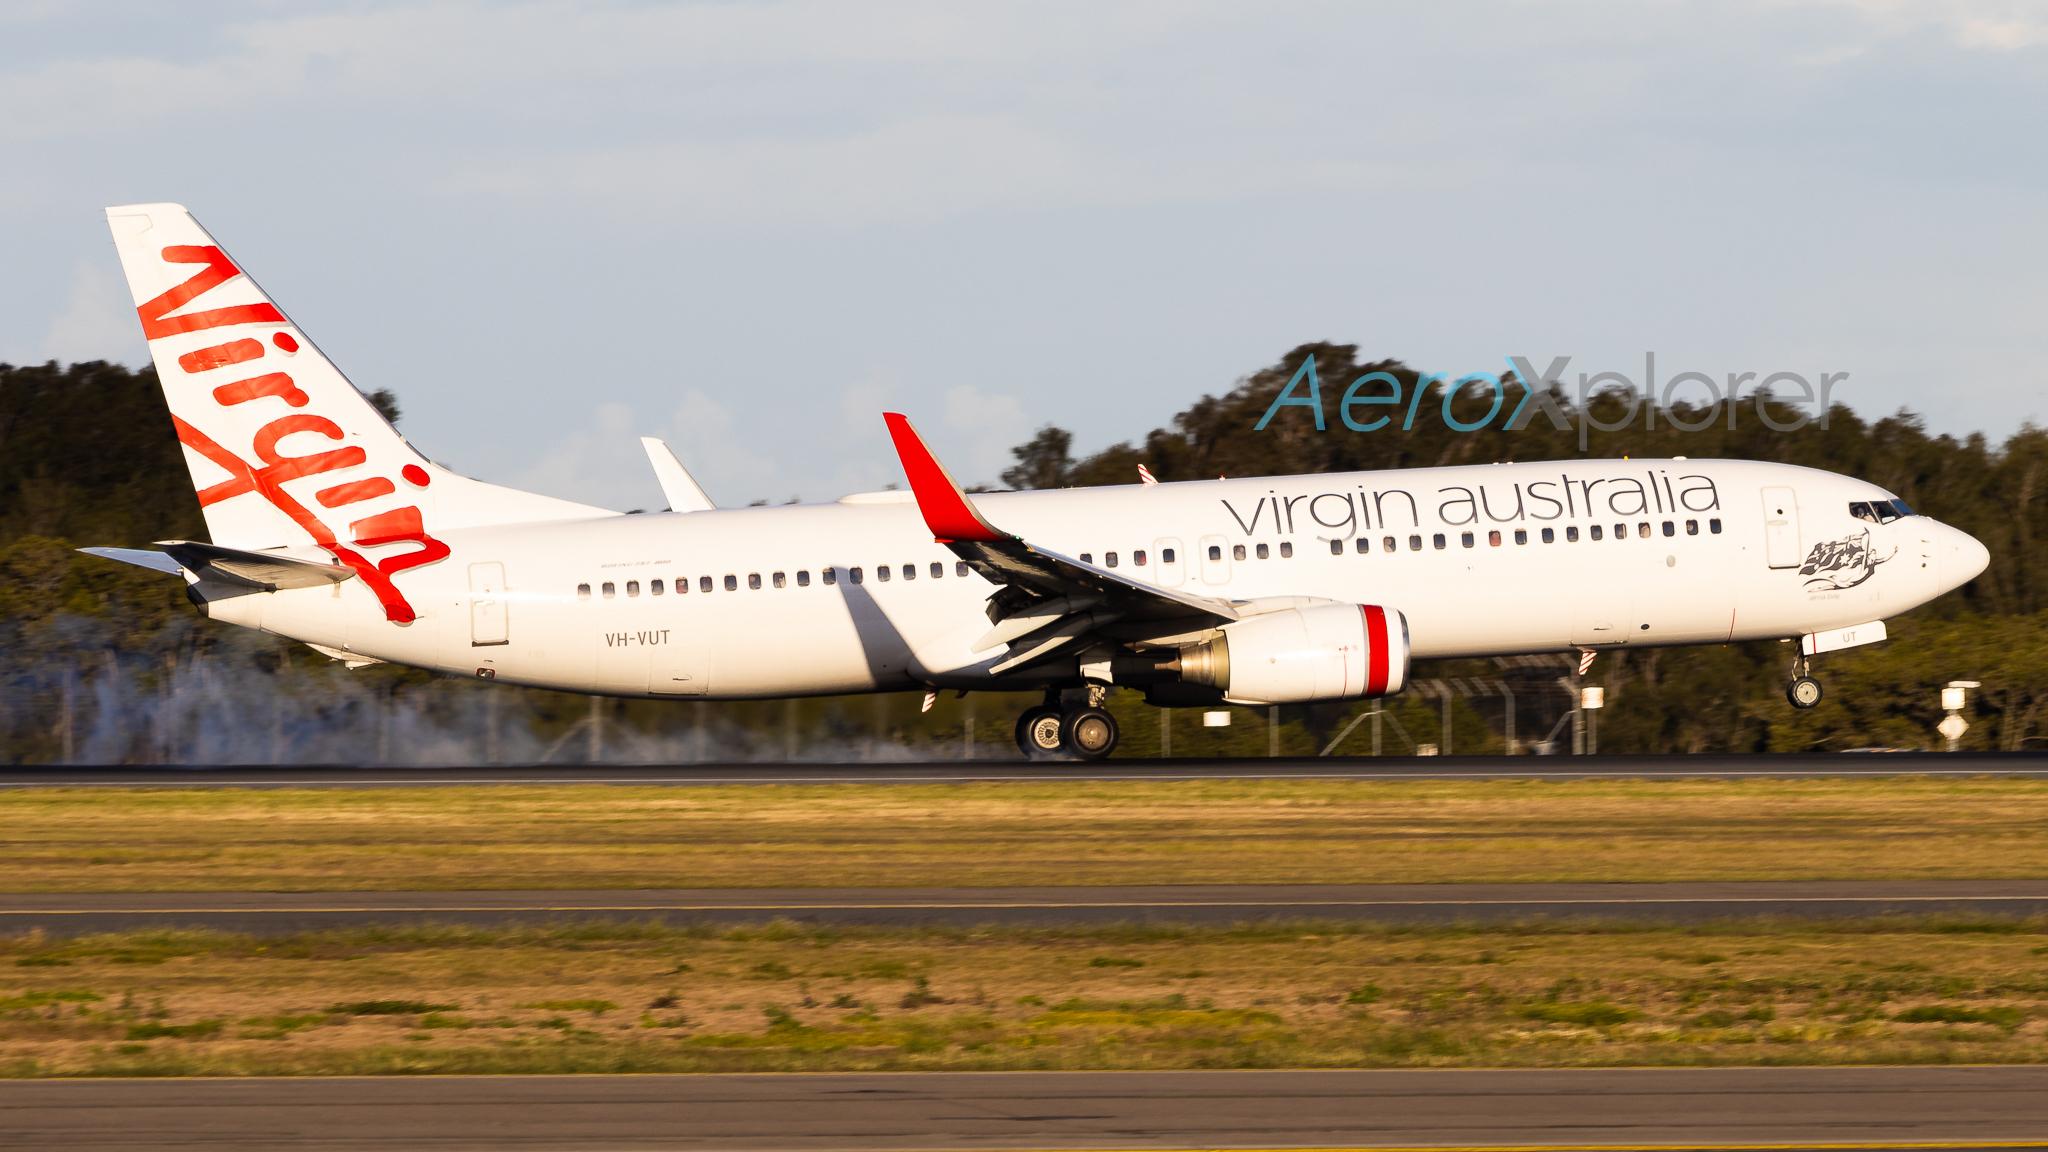 Photo of VH-VUT - Virgin Australia Boeing 737-800 at BNE